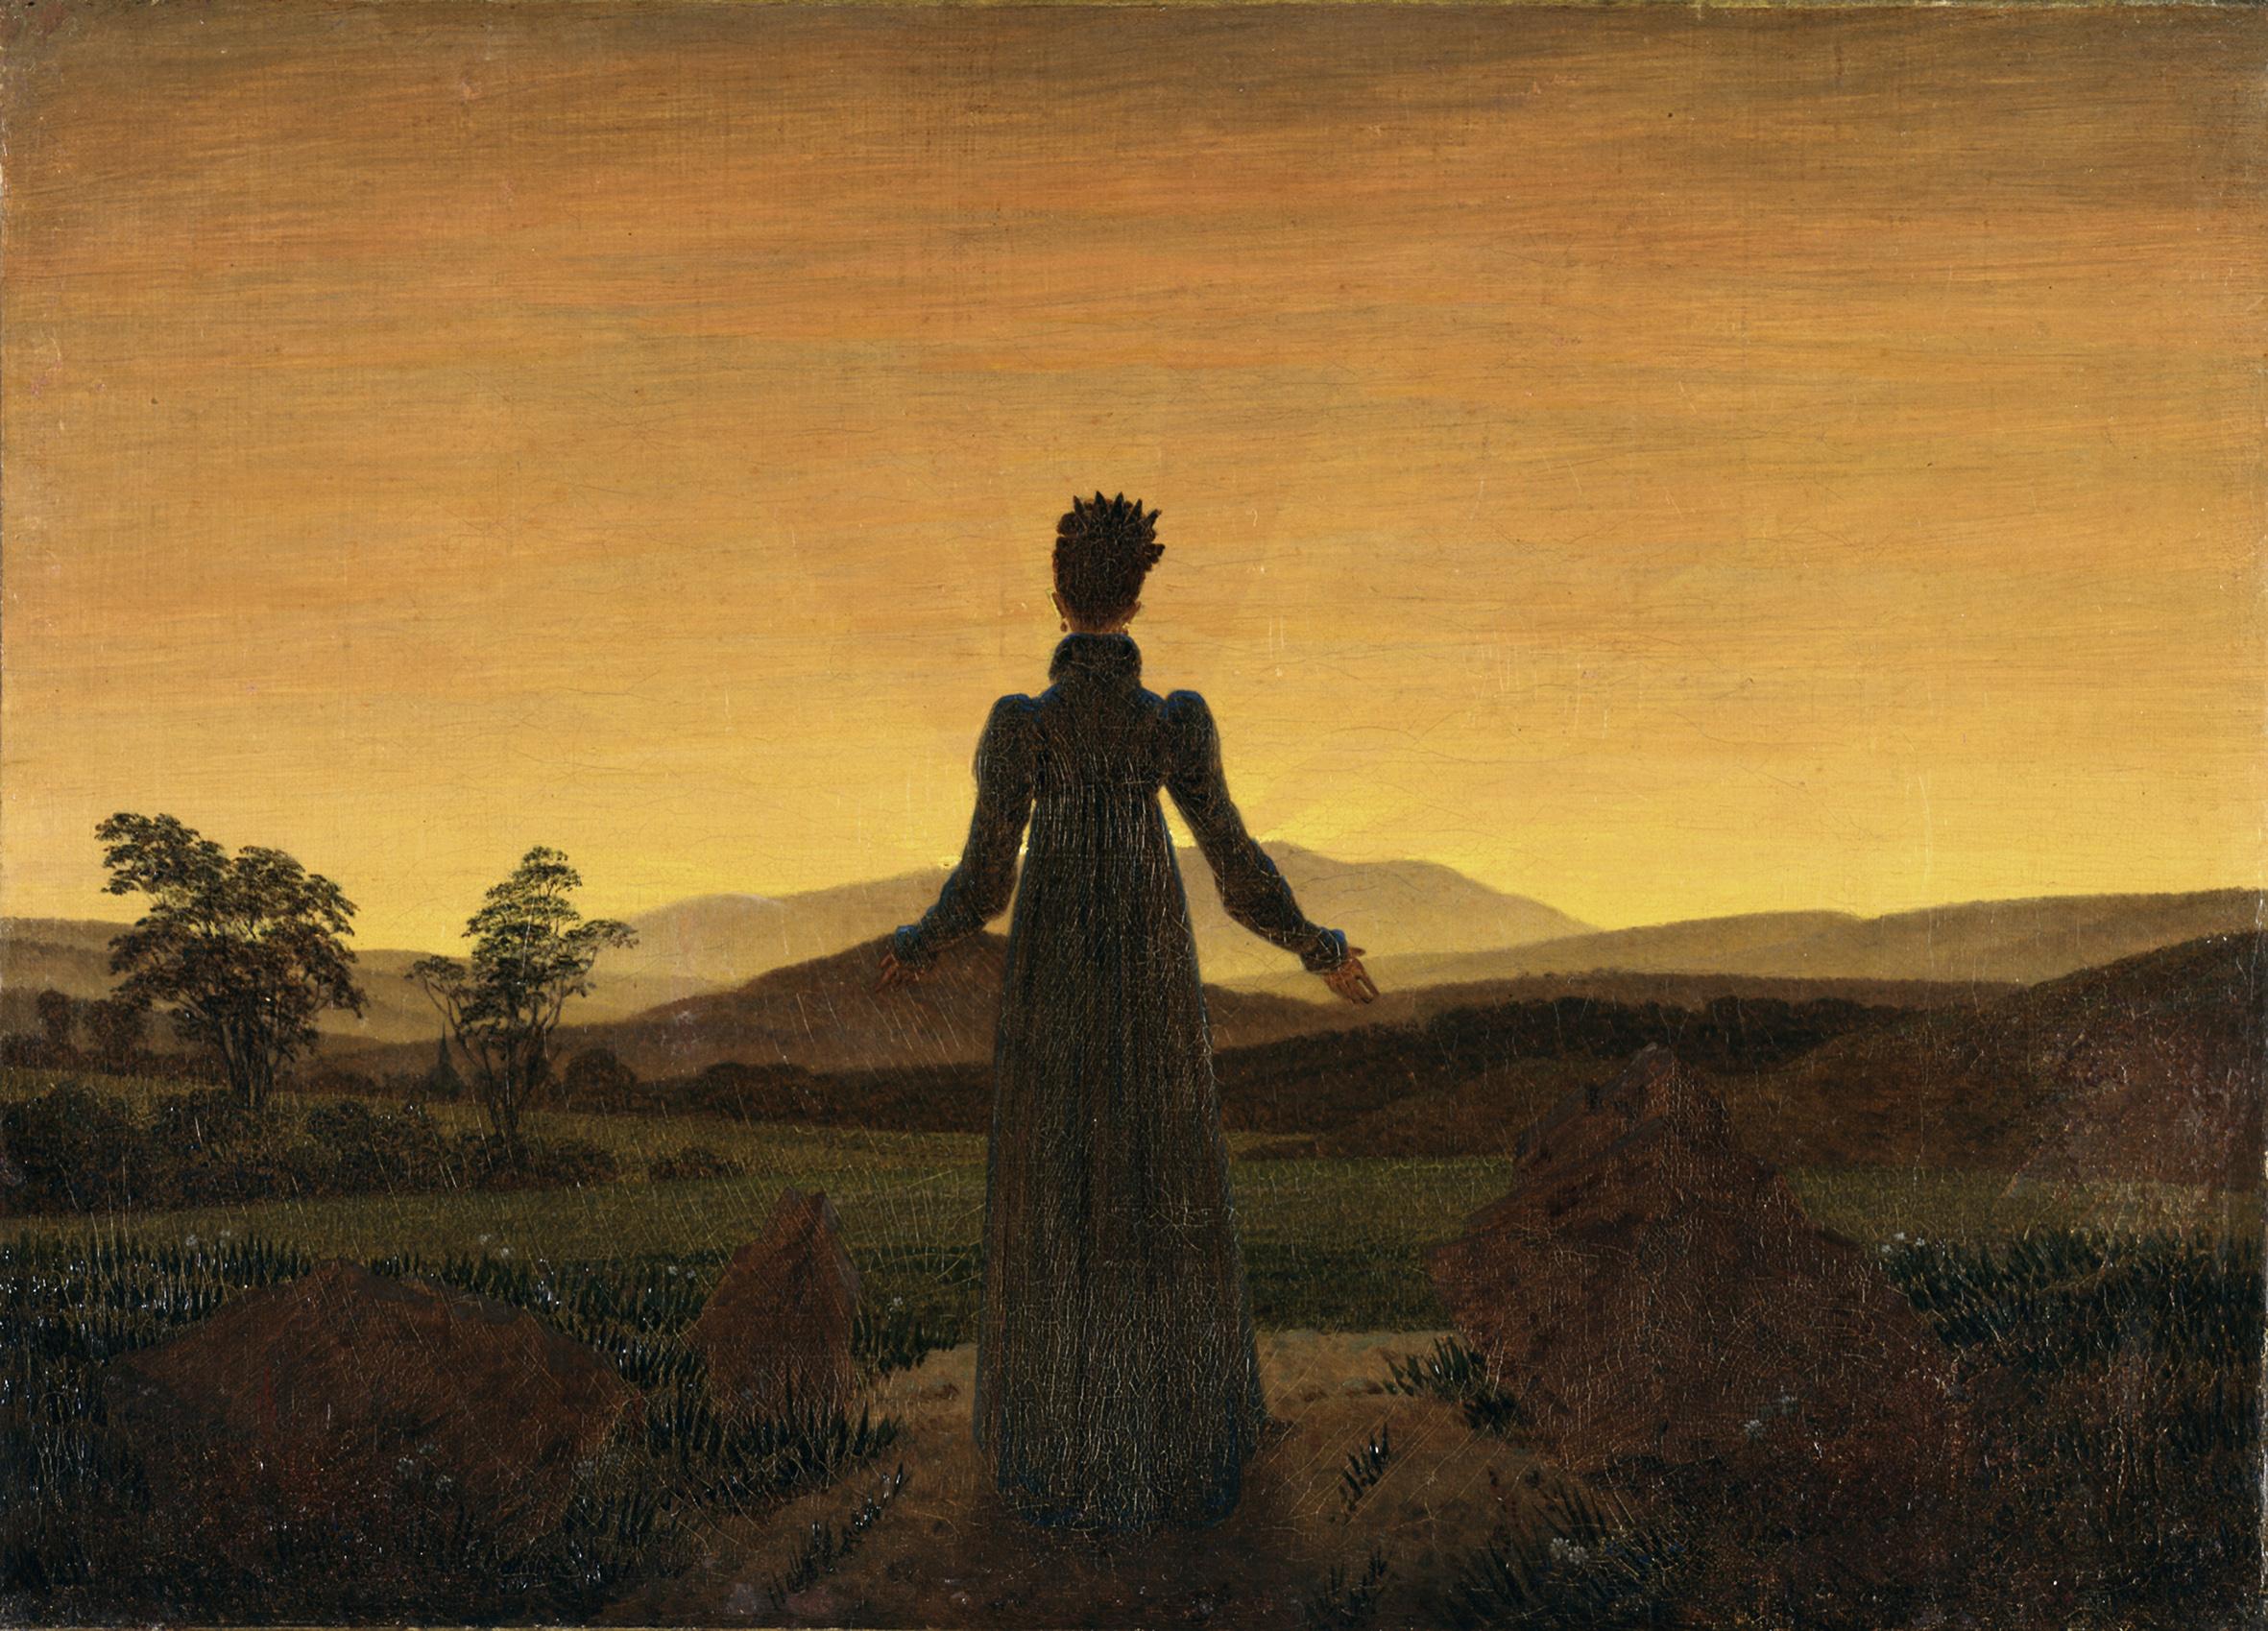 Caspar David Friedrich, Monk by the Sea, c. 1808–1810, oil on canvas. WIKIMEDIA COMMONS Caspar David Friedrich, Woman Before Rising Sun, ca. 1818, oil on canvas.